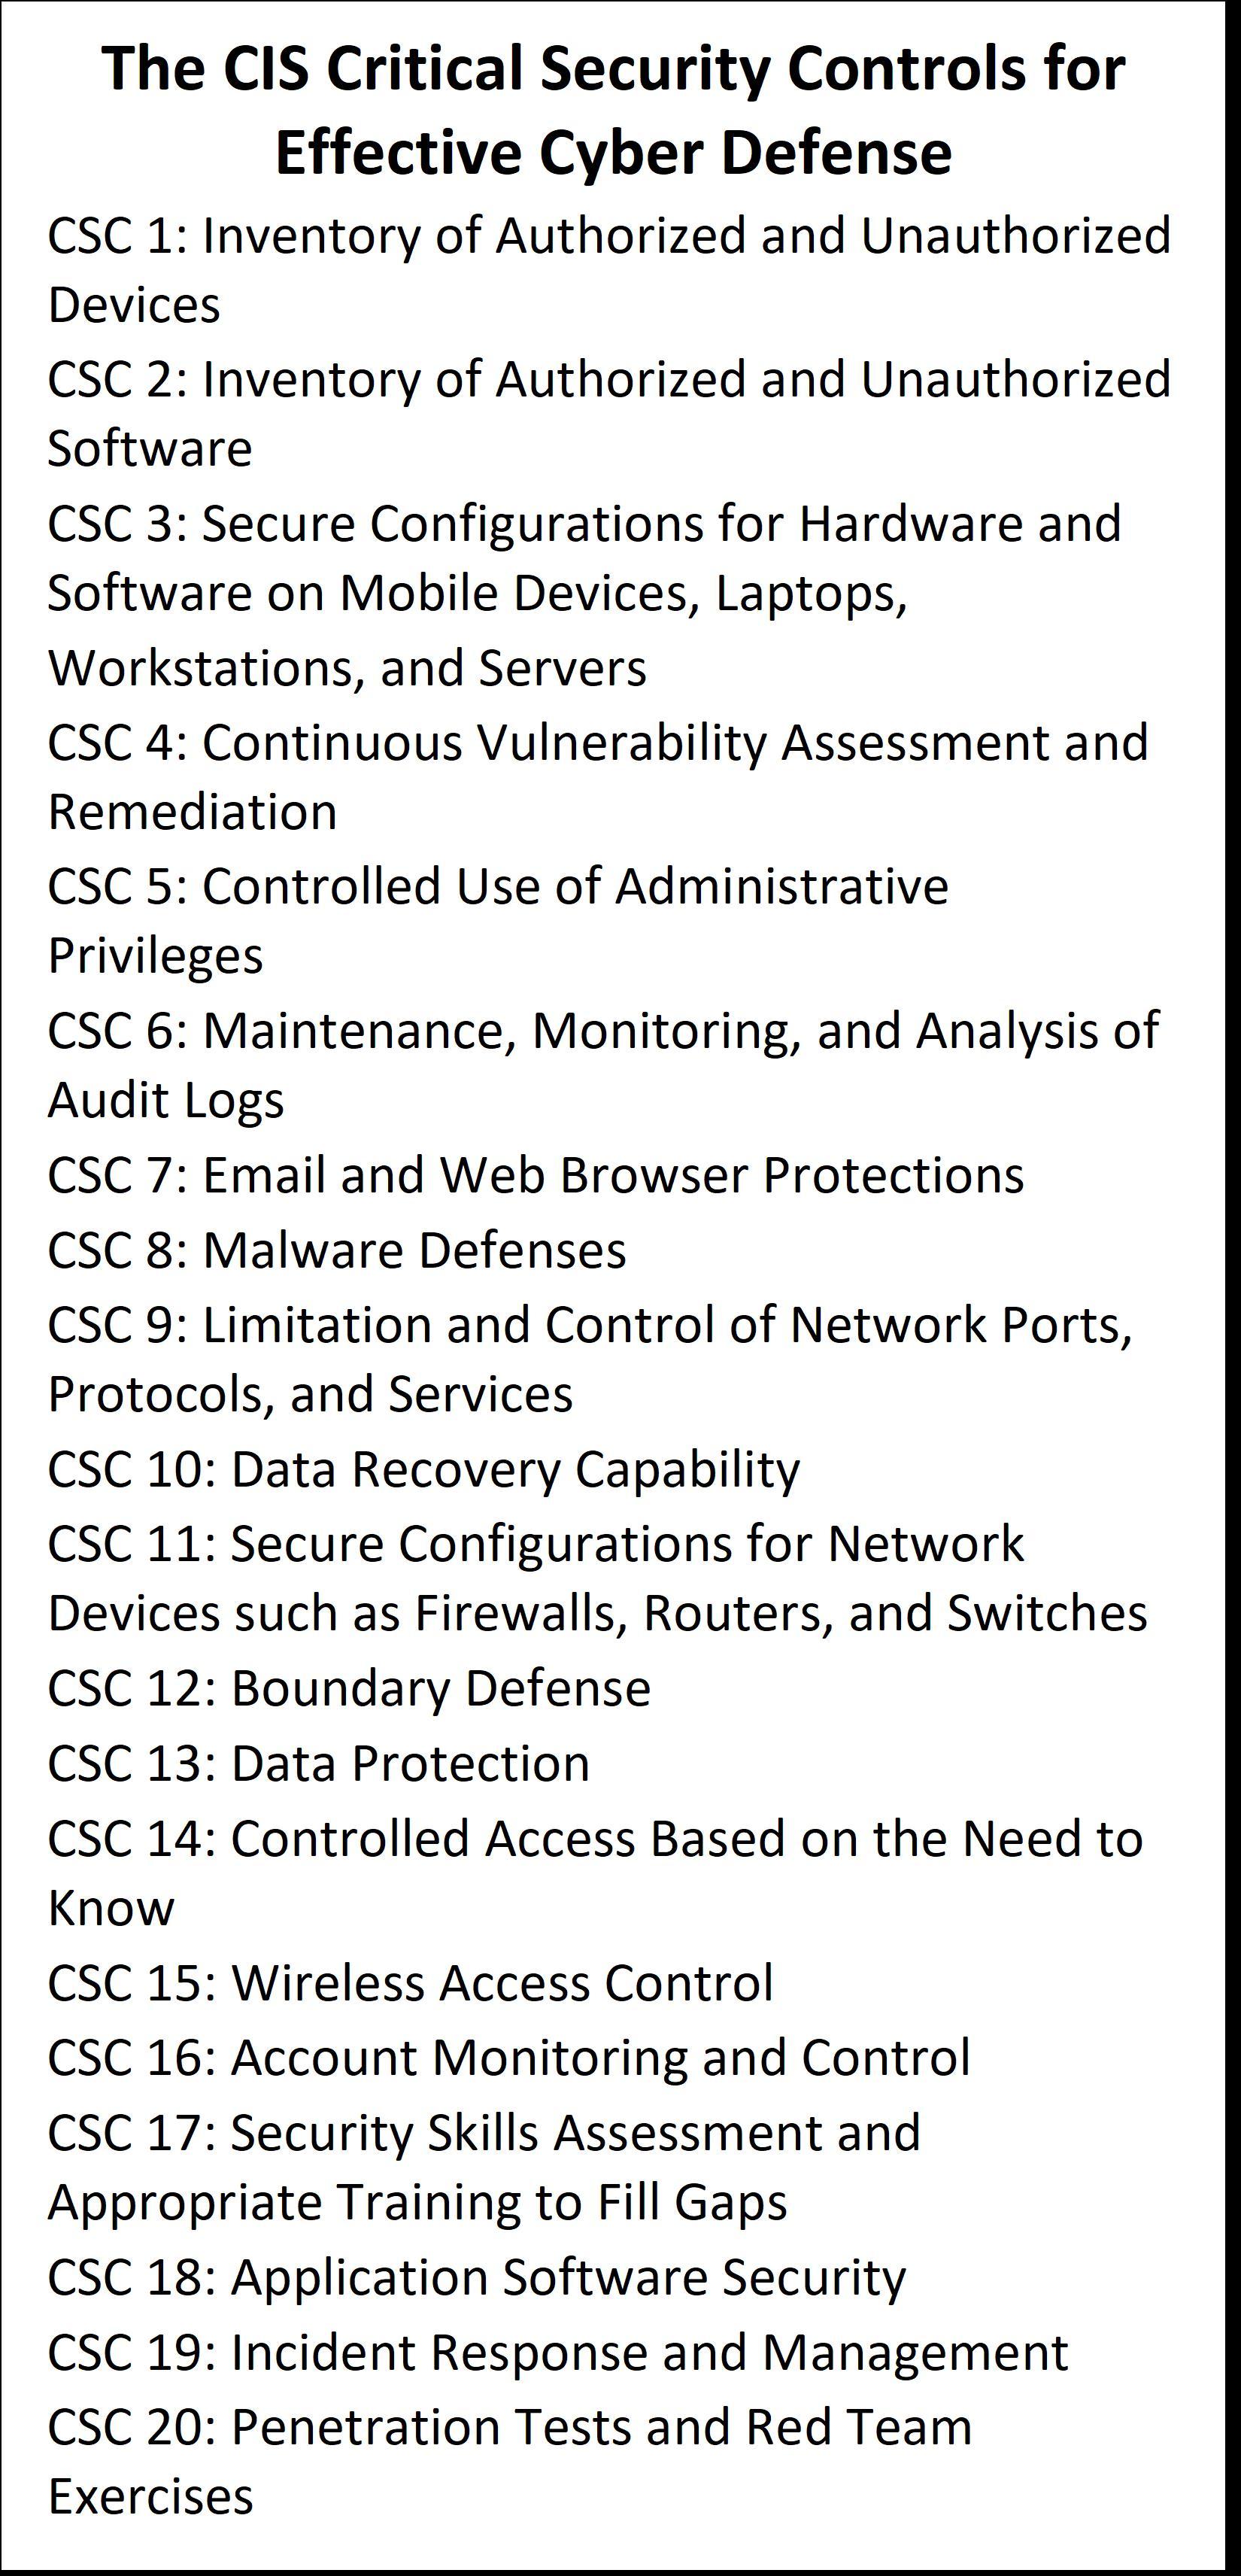 CIS-critical-security-controls.jpg